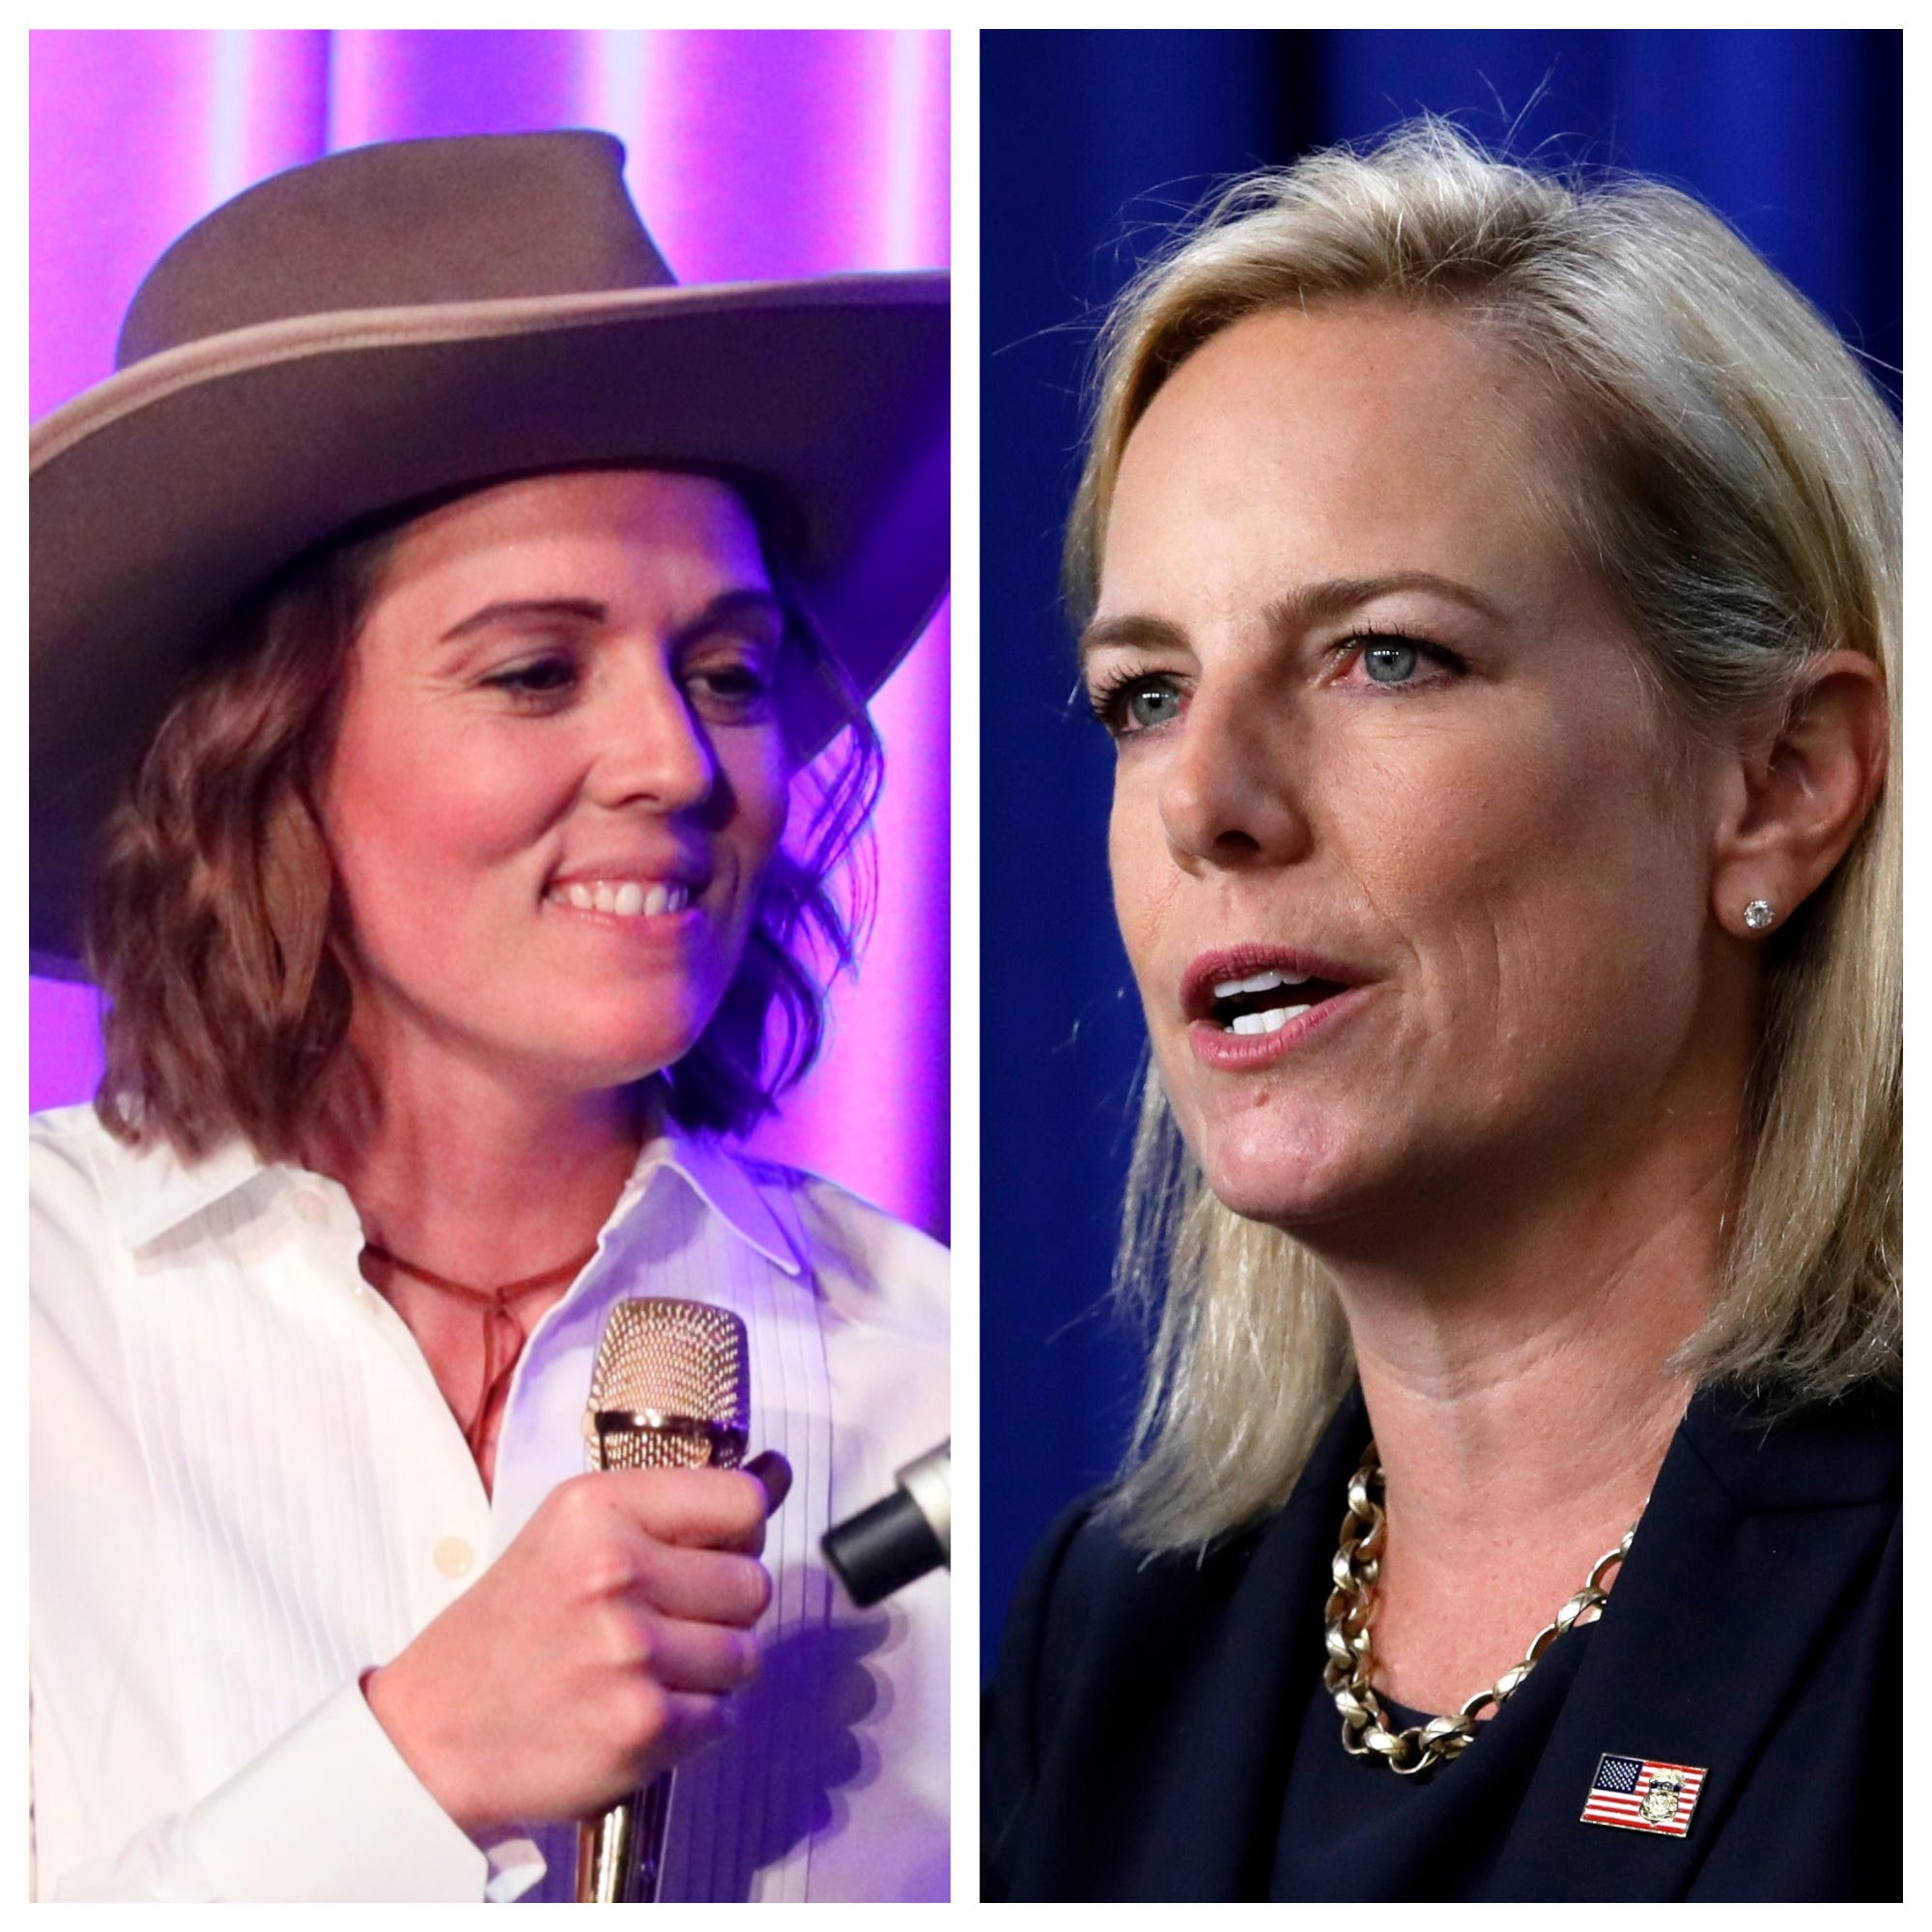 Brandi Carlile boycotts womens summitover former Trump DHS secretary Kirstjen Nielsen